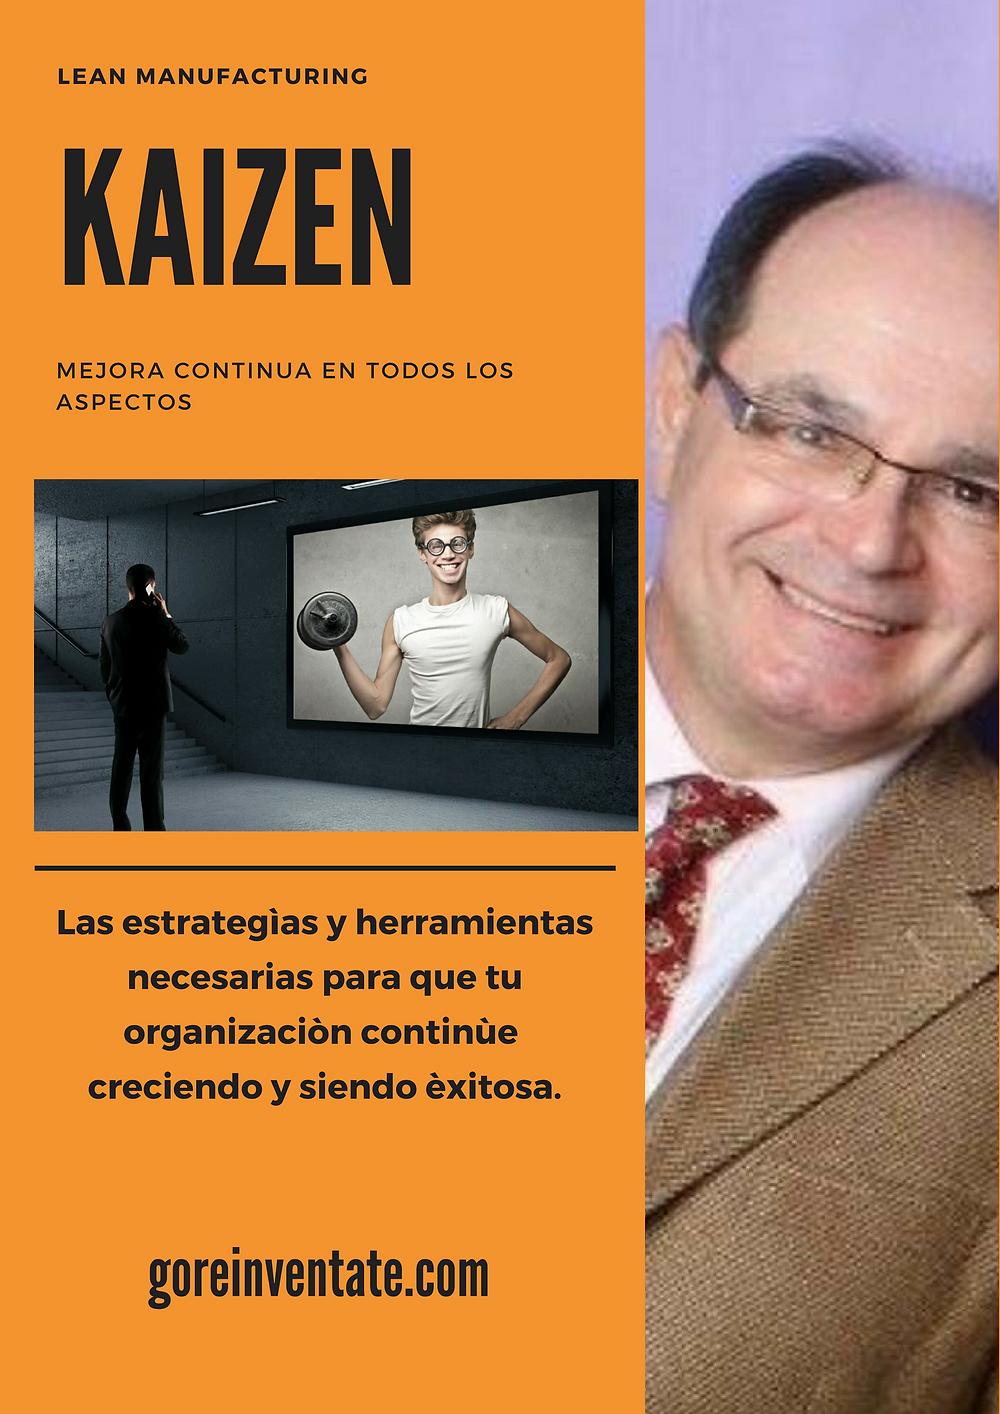 Kaizen, Jesus Maza, Mejora continua, Lean Manufacturing, Leanmanufacturing, reinventatehoy